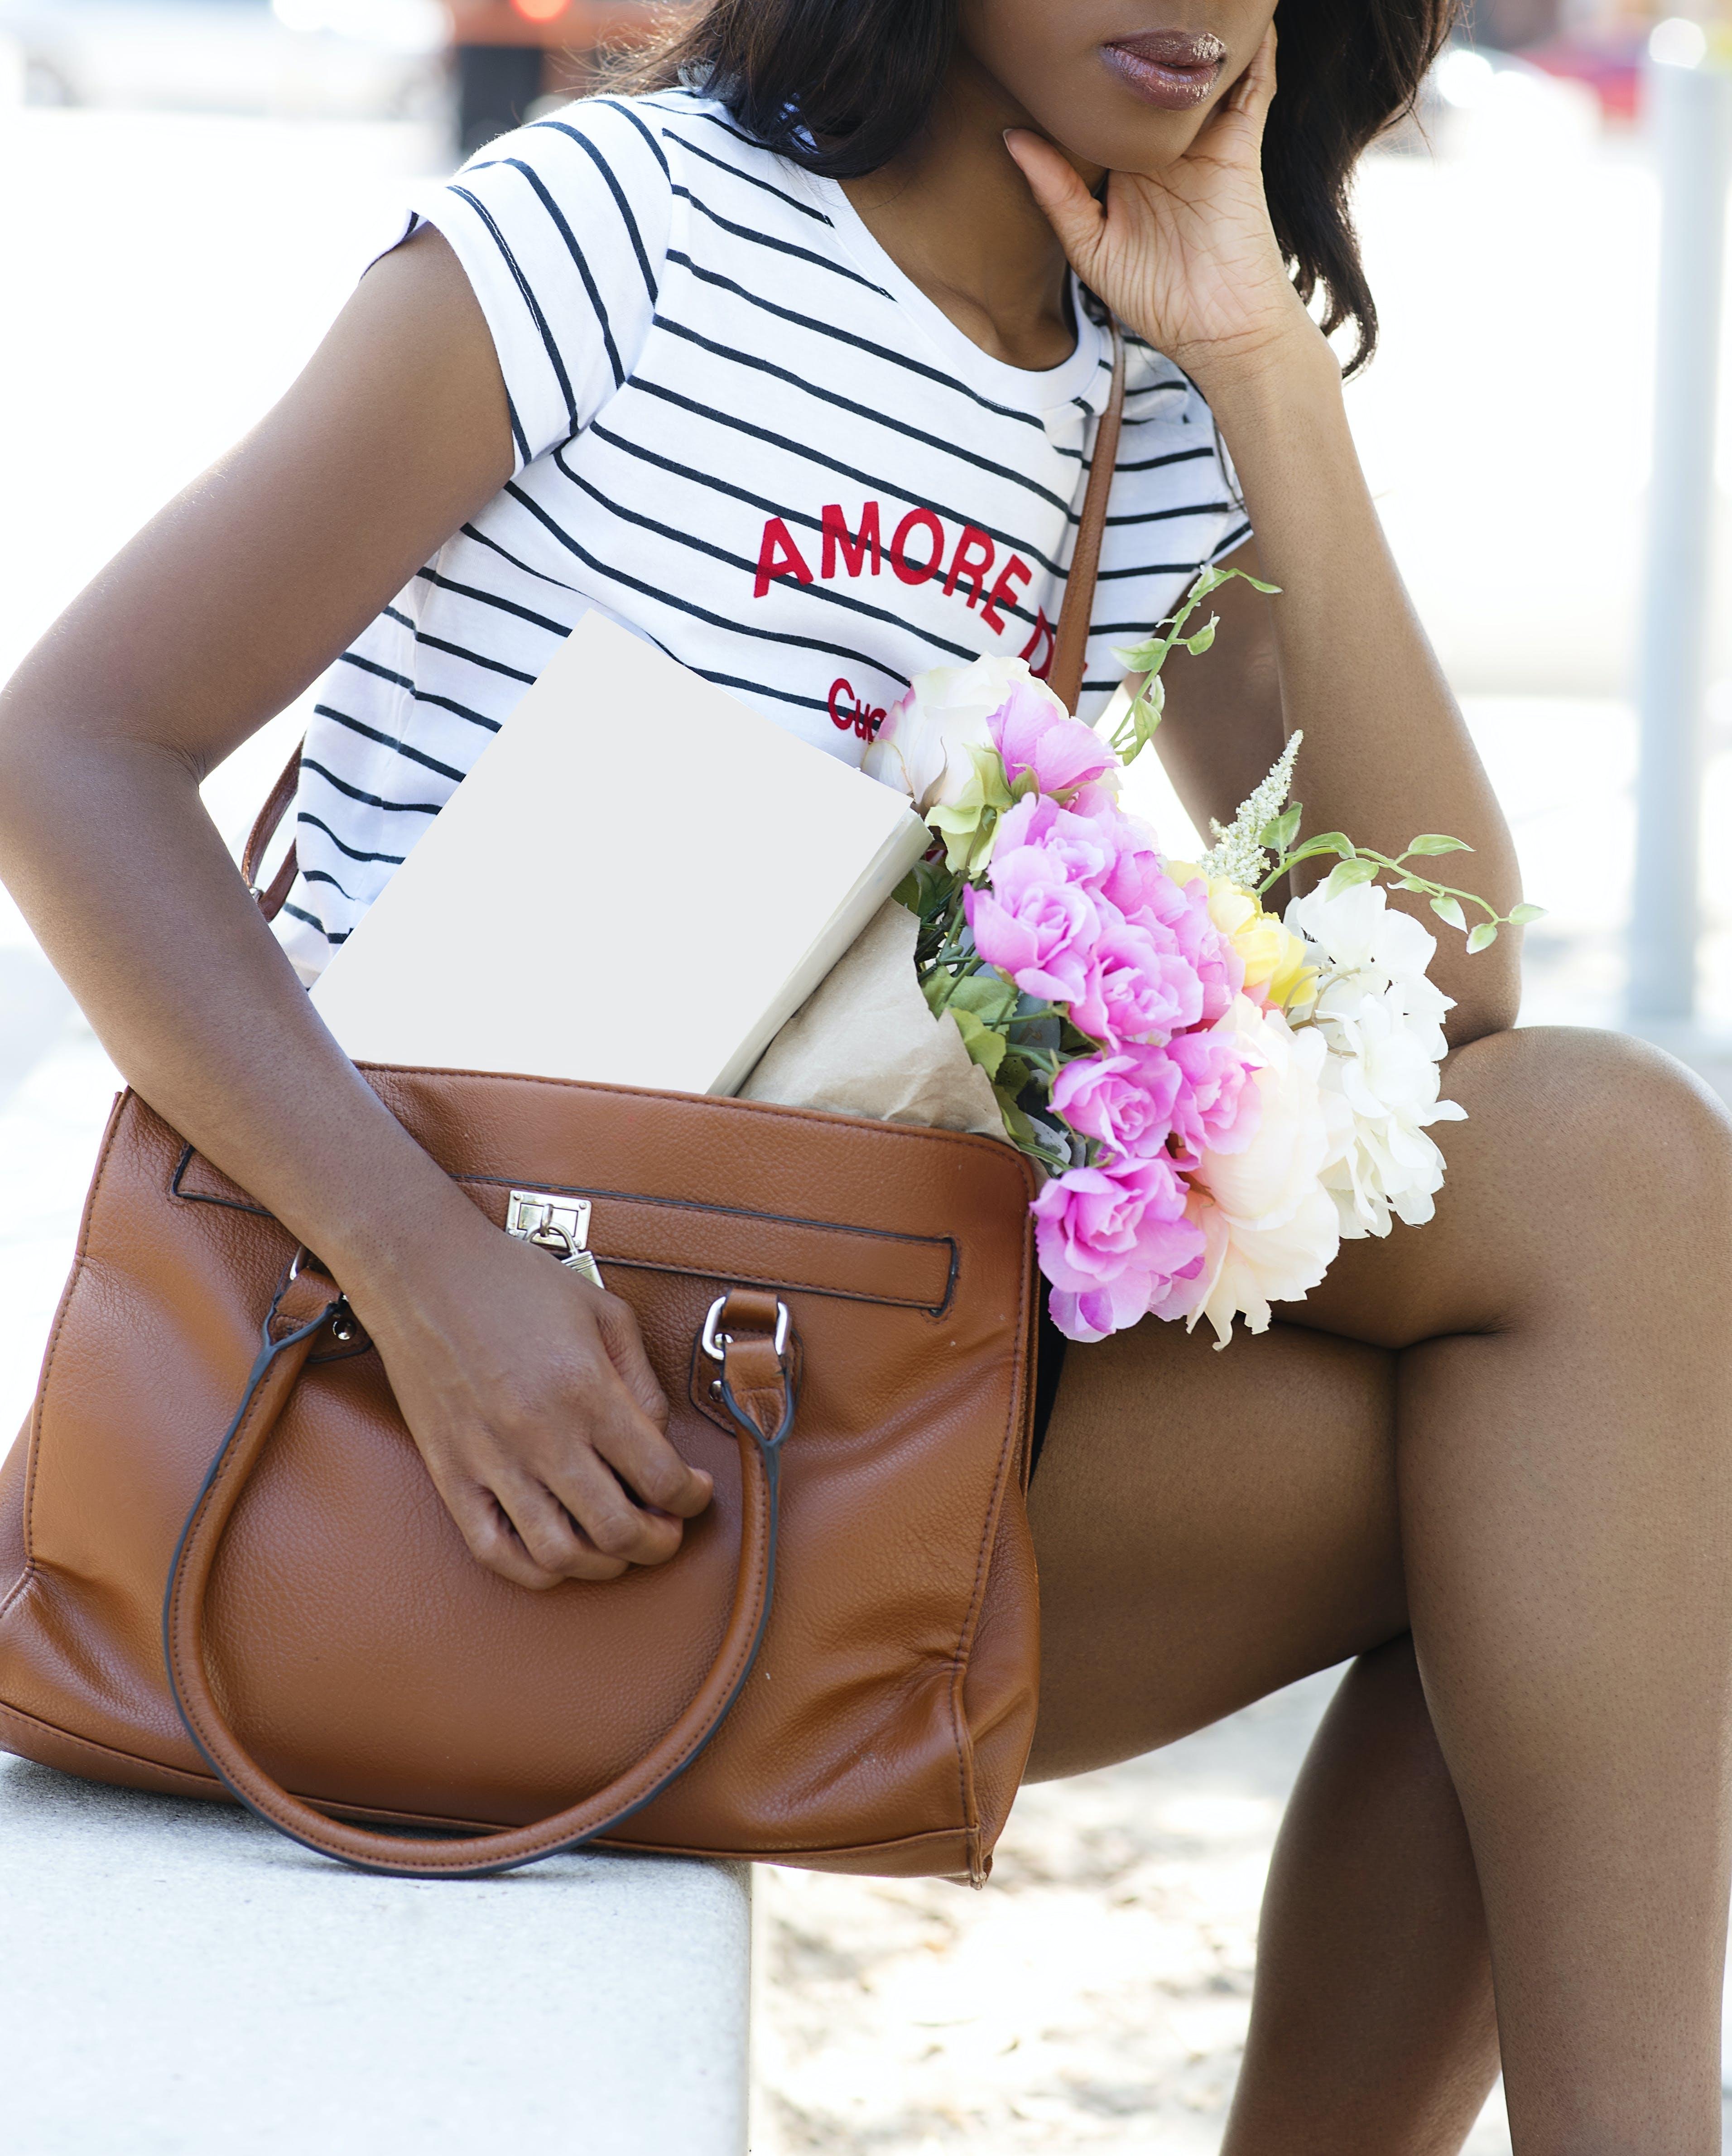 Free stock photo of african american girl, black model, black woman, blogger